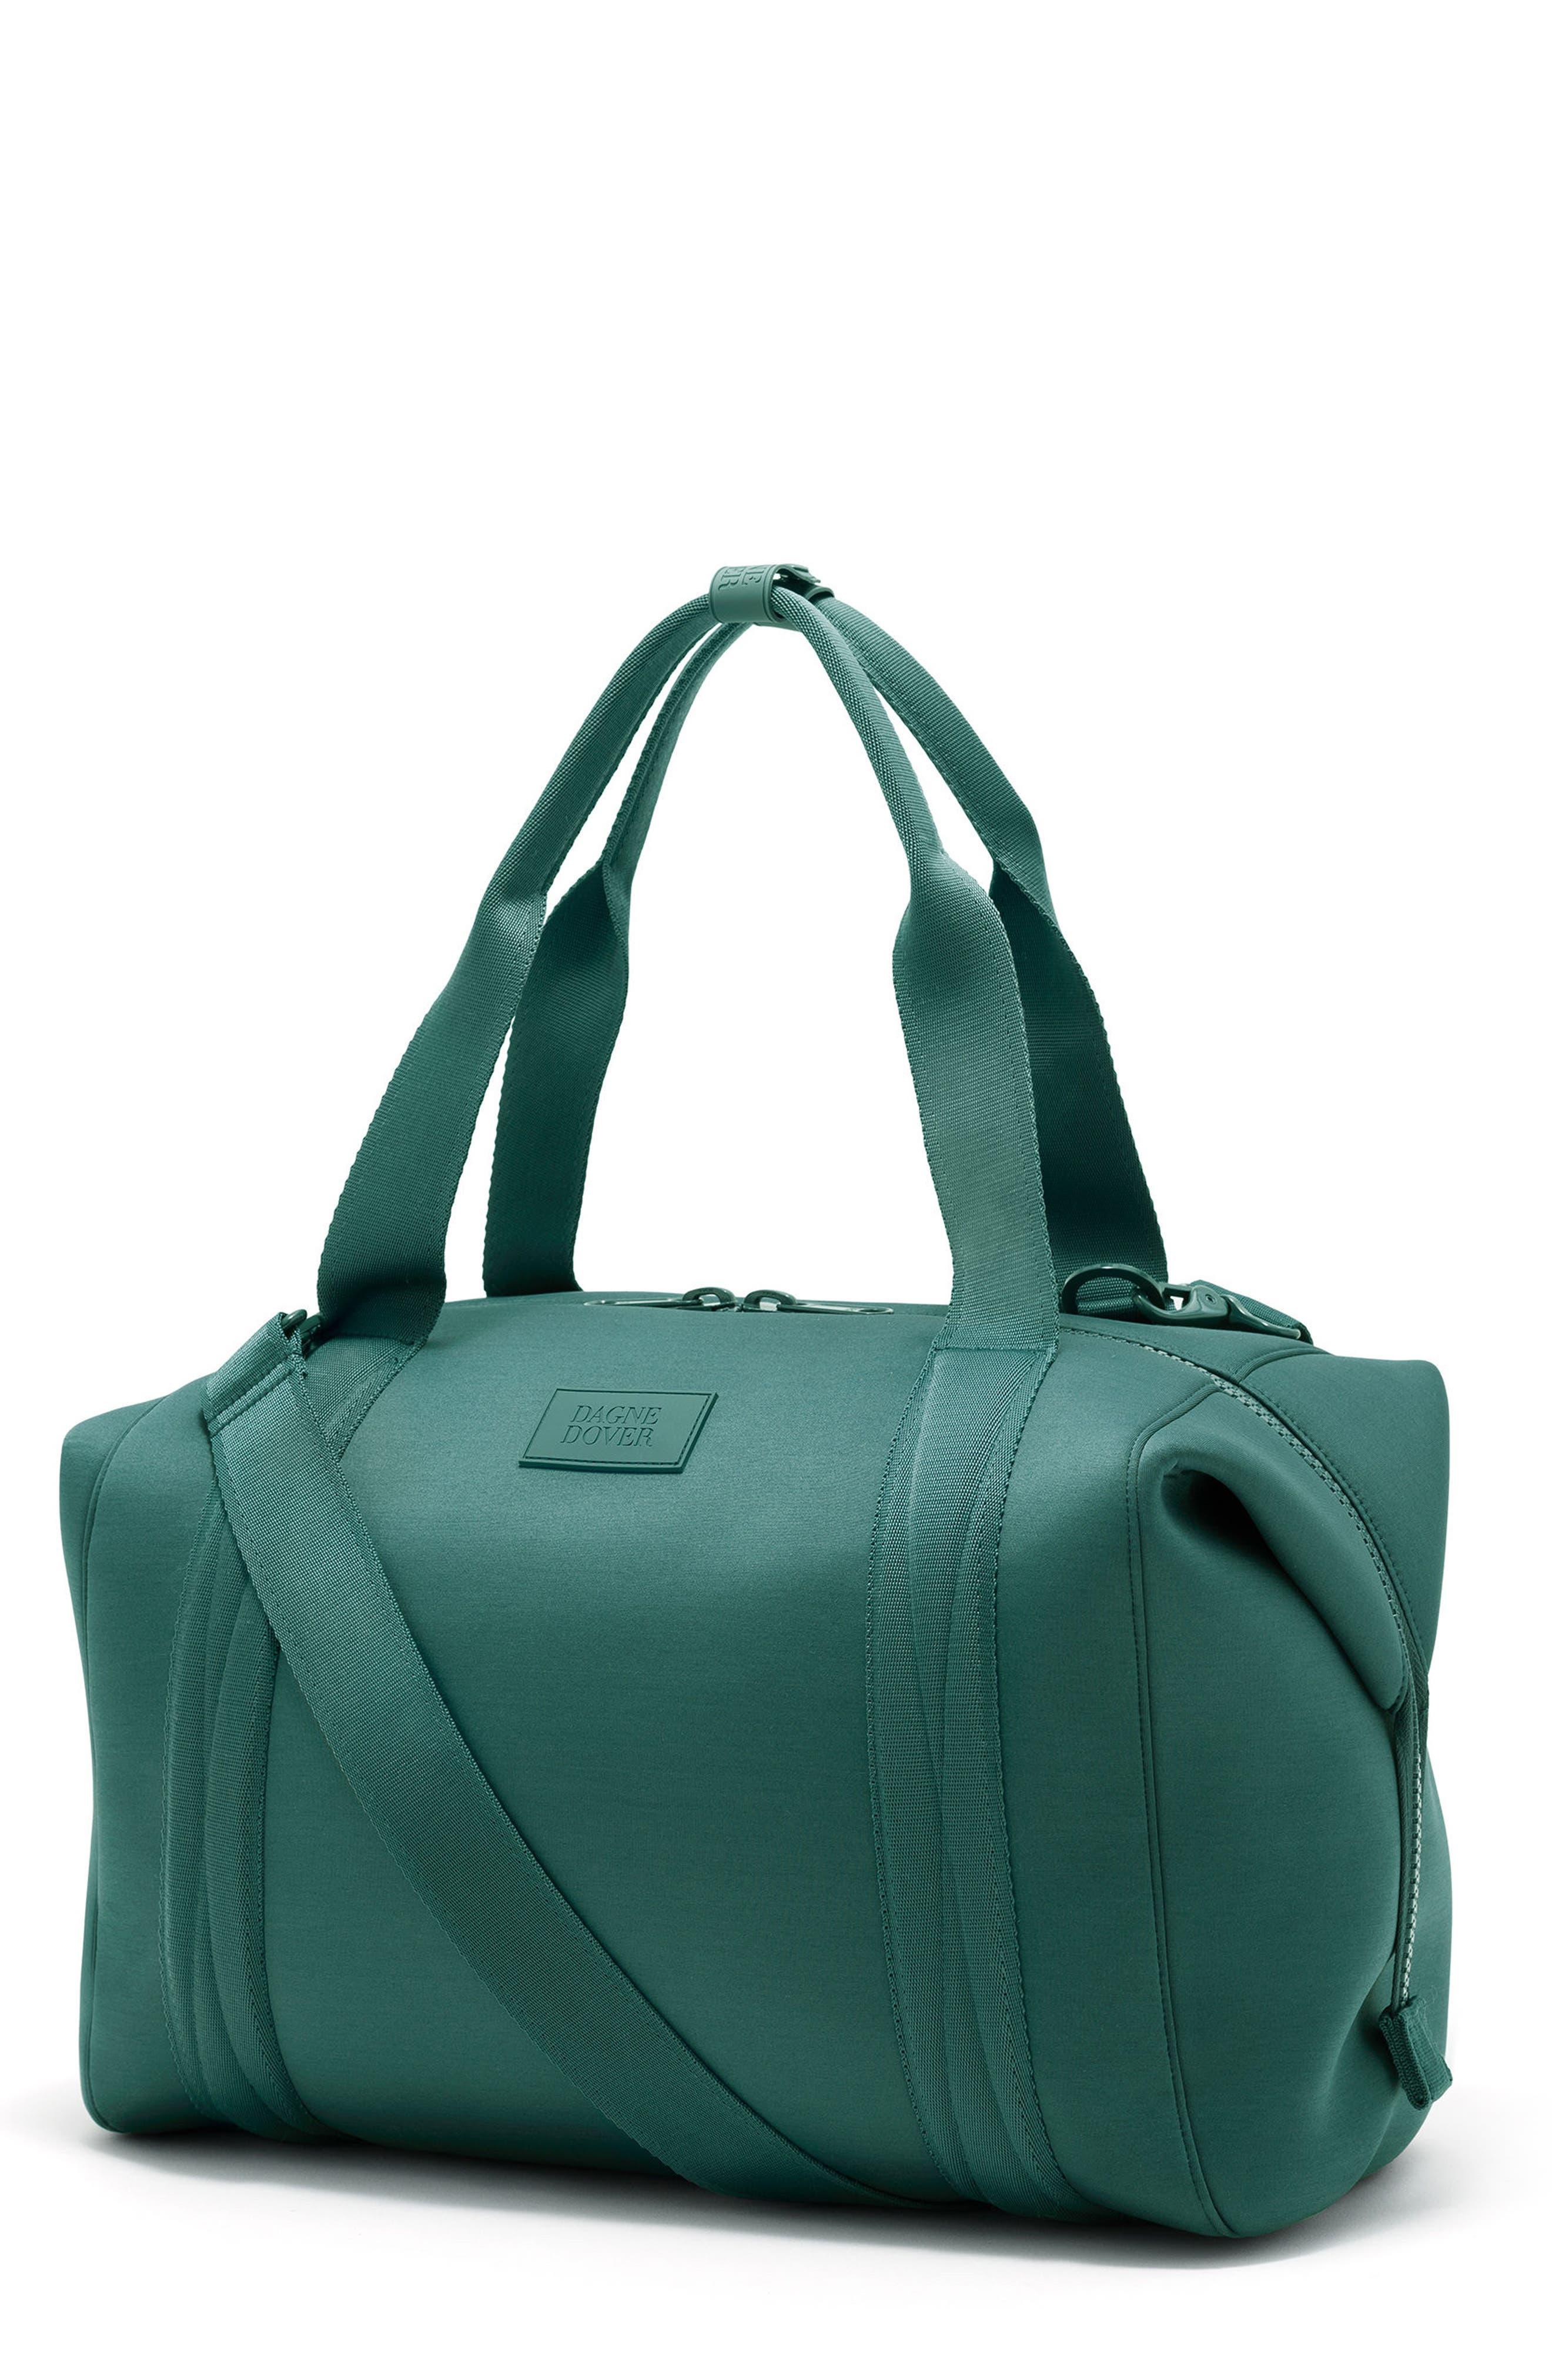 365 Large Landon Neoprene Carryall Duffel Bag,                             Main thumbnail 6, color,